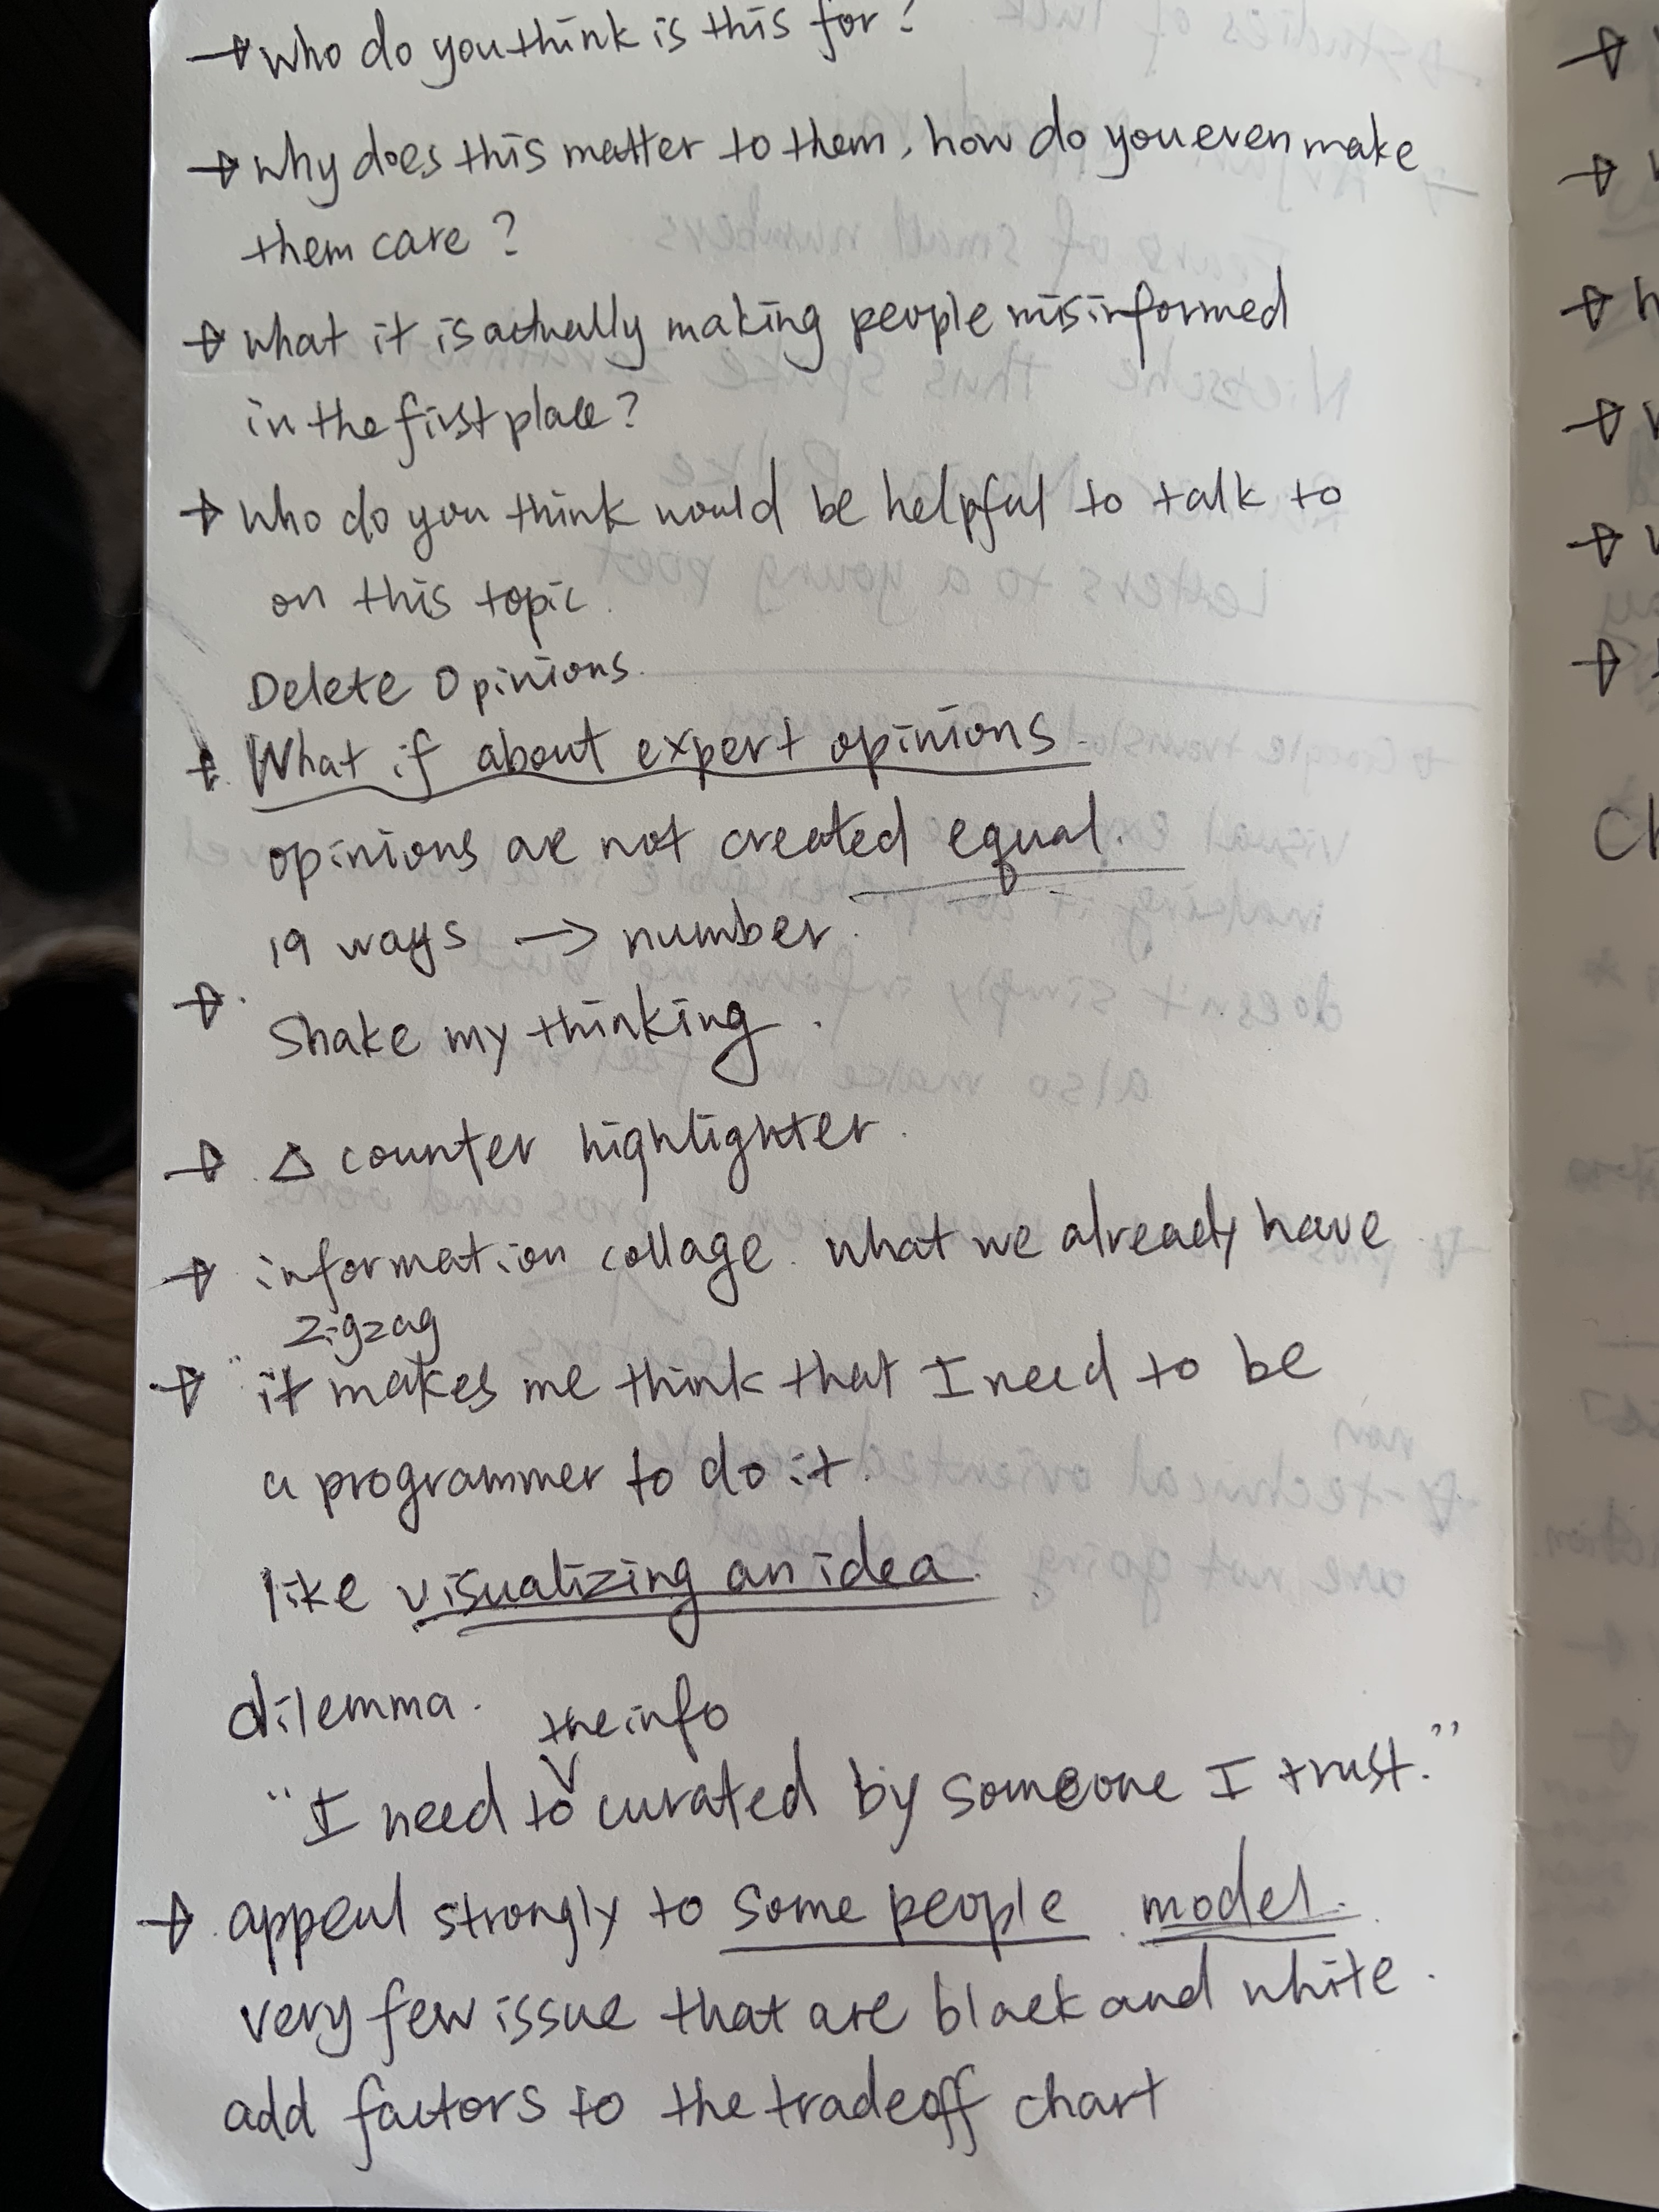 Barry's suggestions @Tara Lin